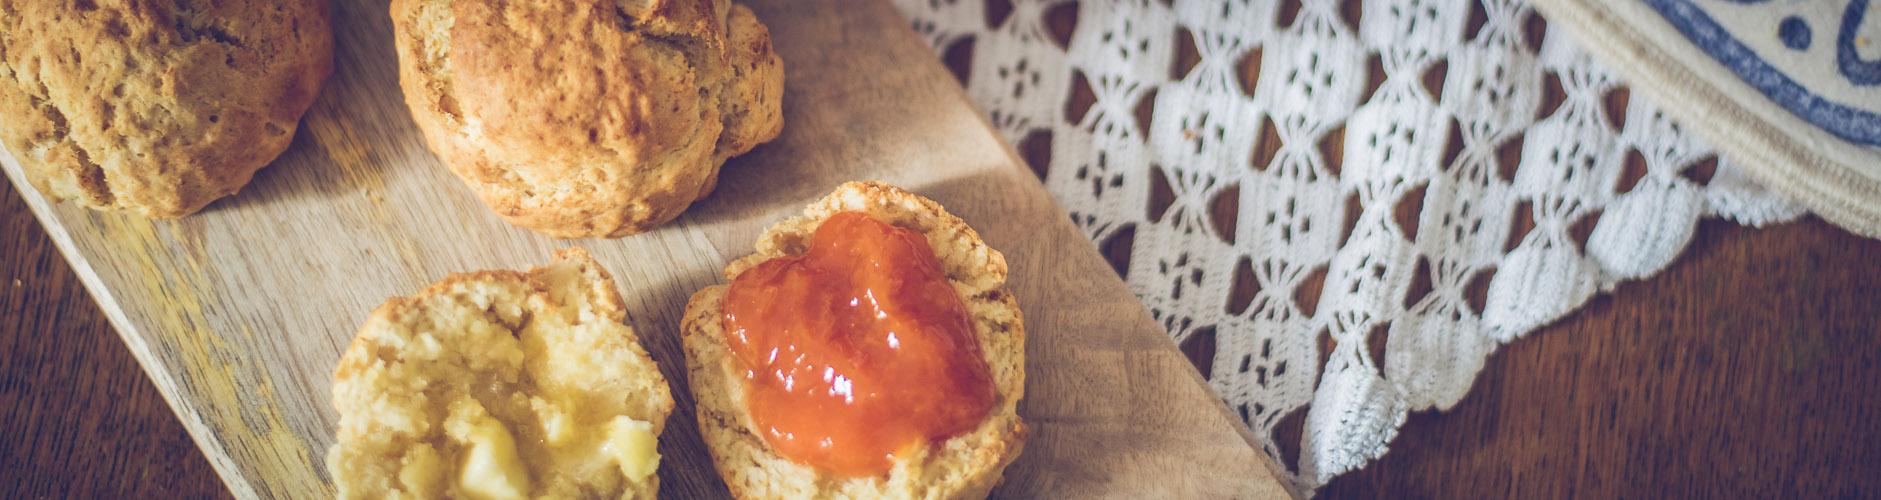 Super Easy Vegan Buttermilk Biscuits